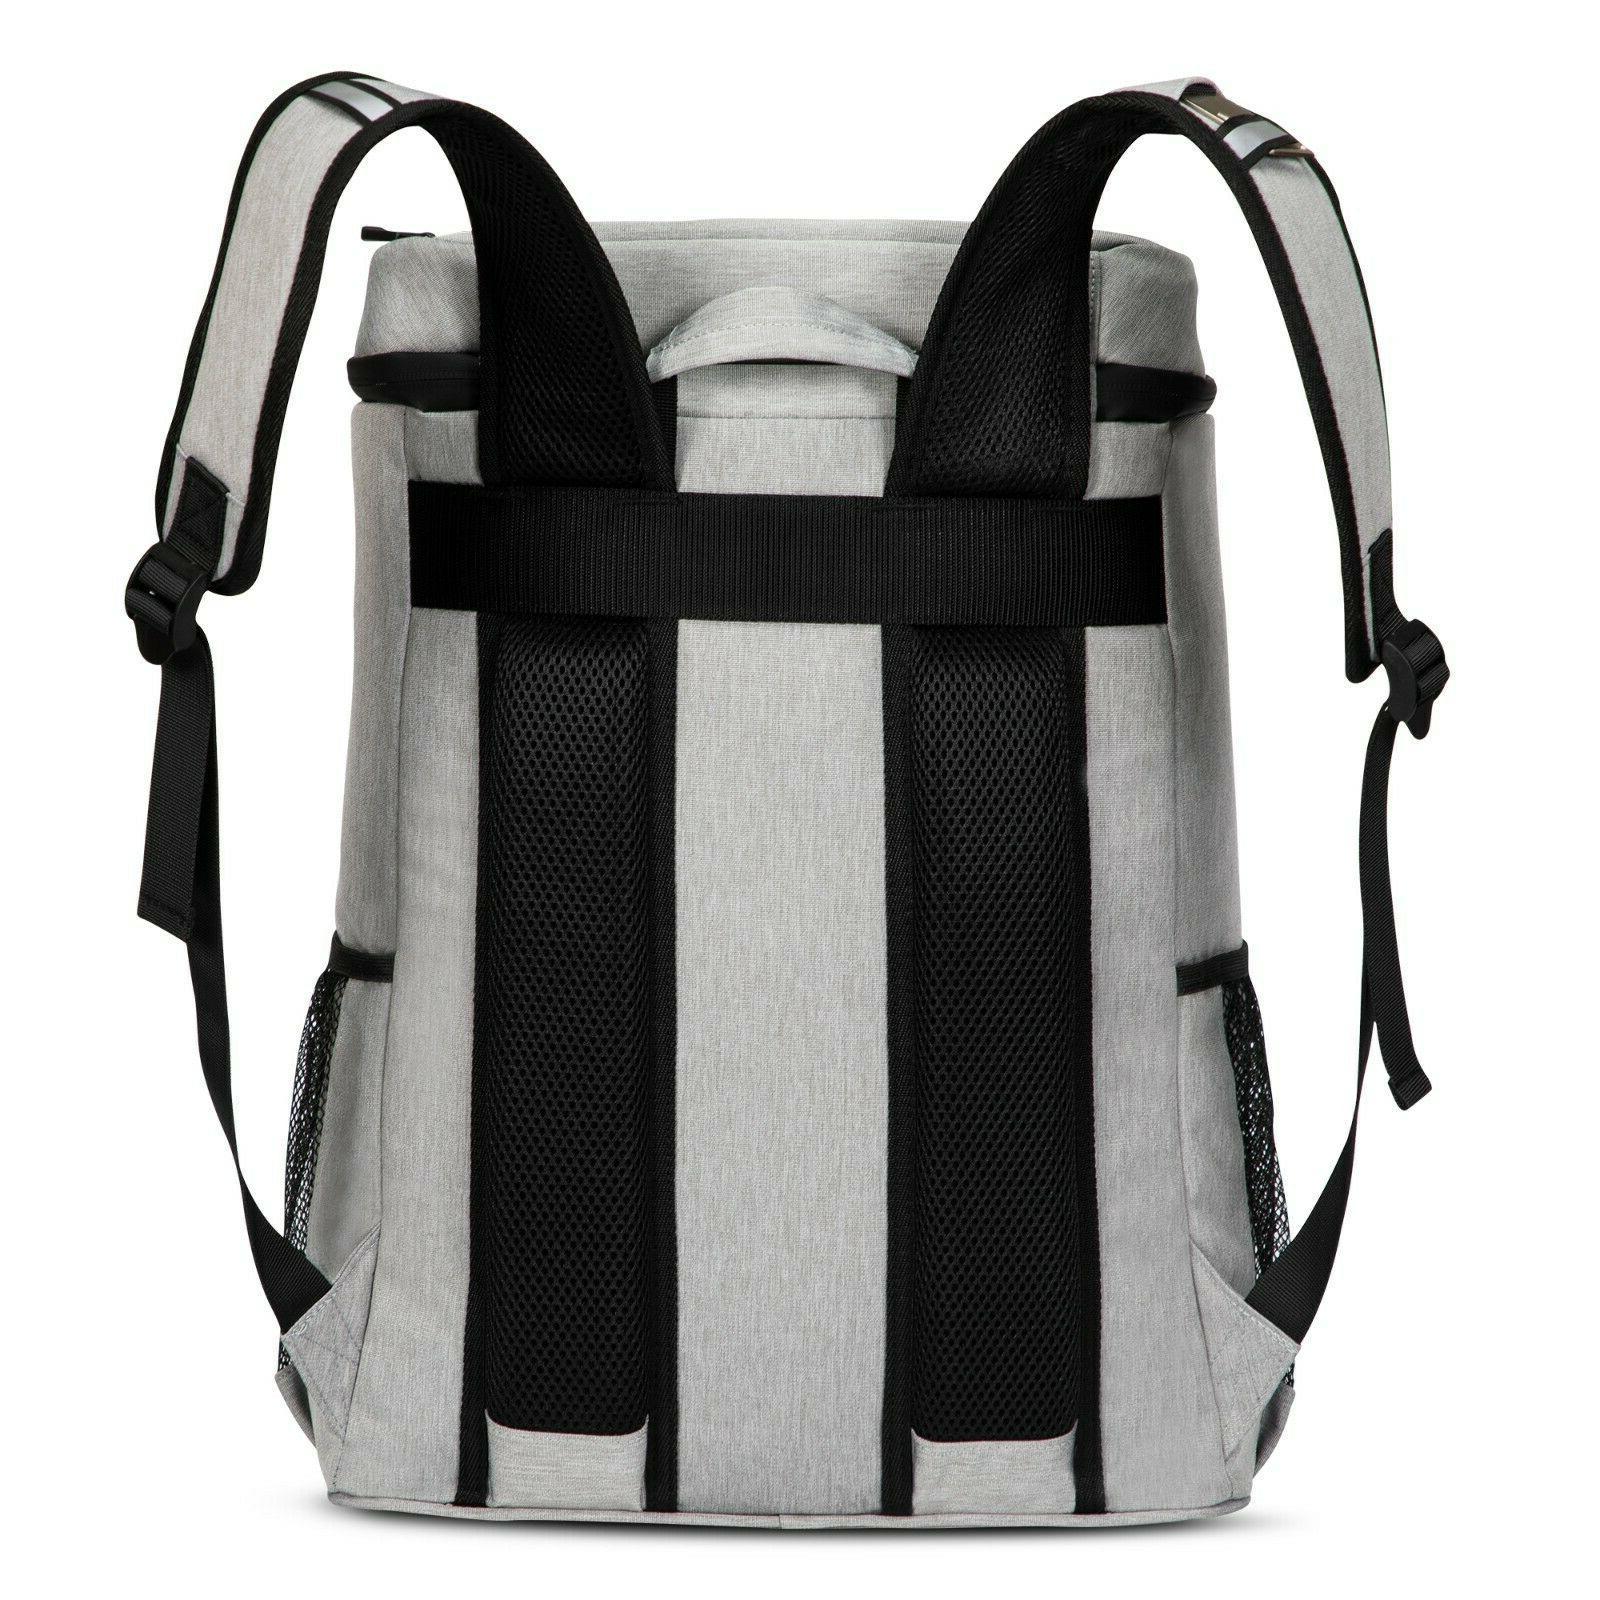 40 Cans Backpack Leak-Proof Soft Cooler Women